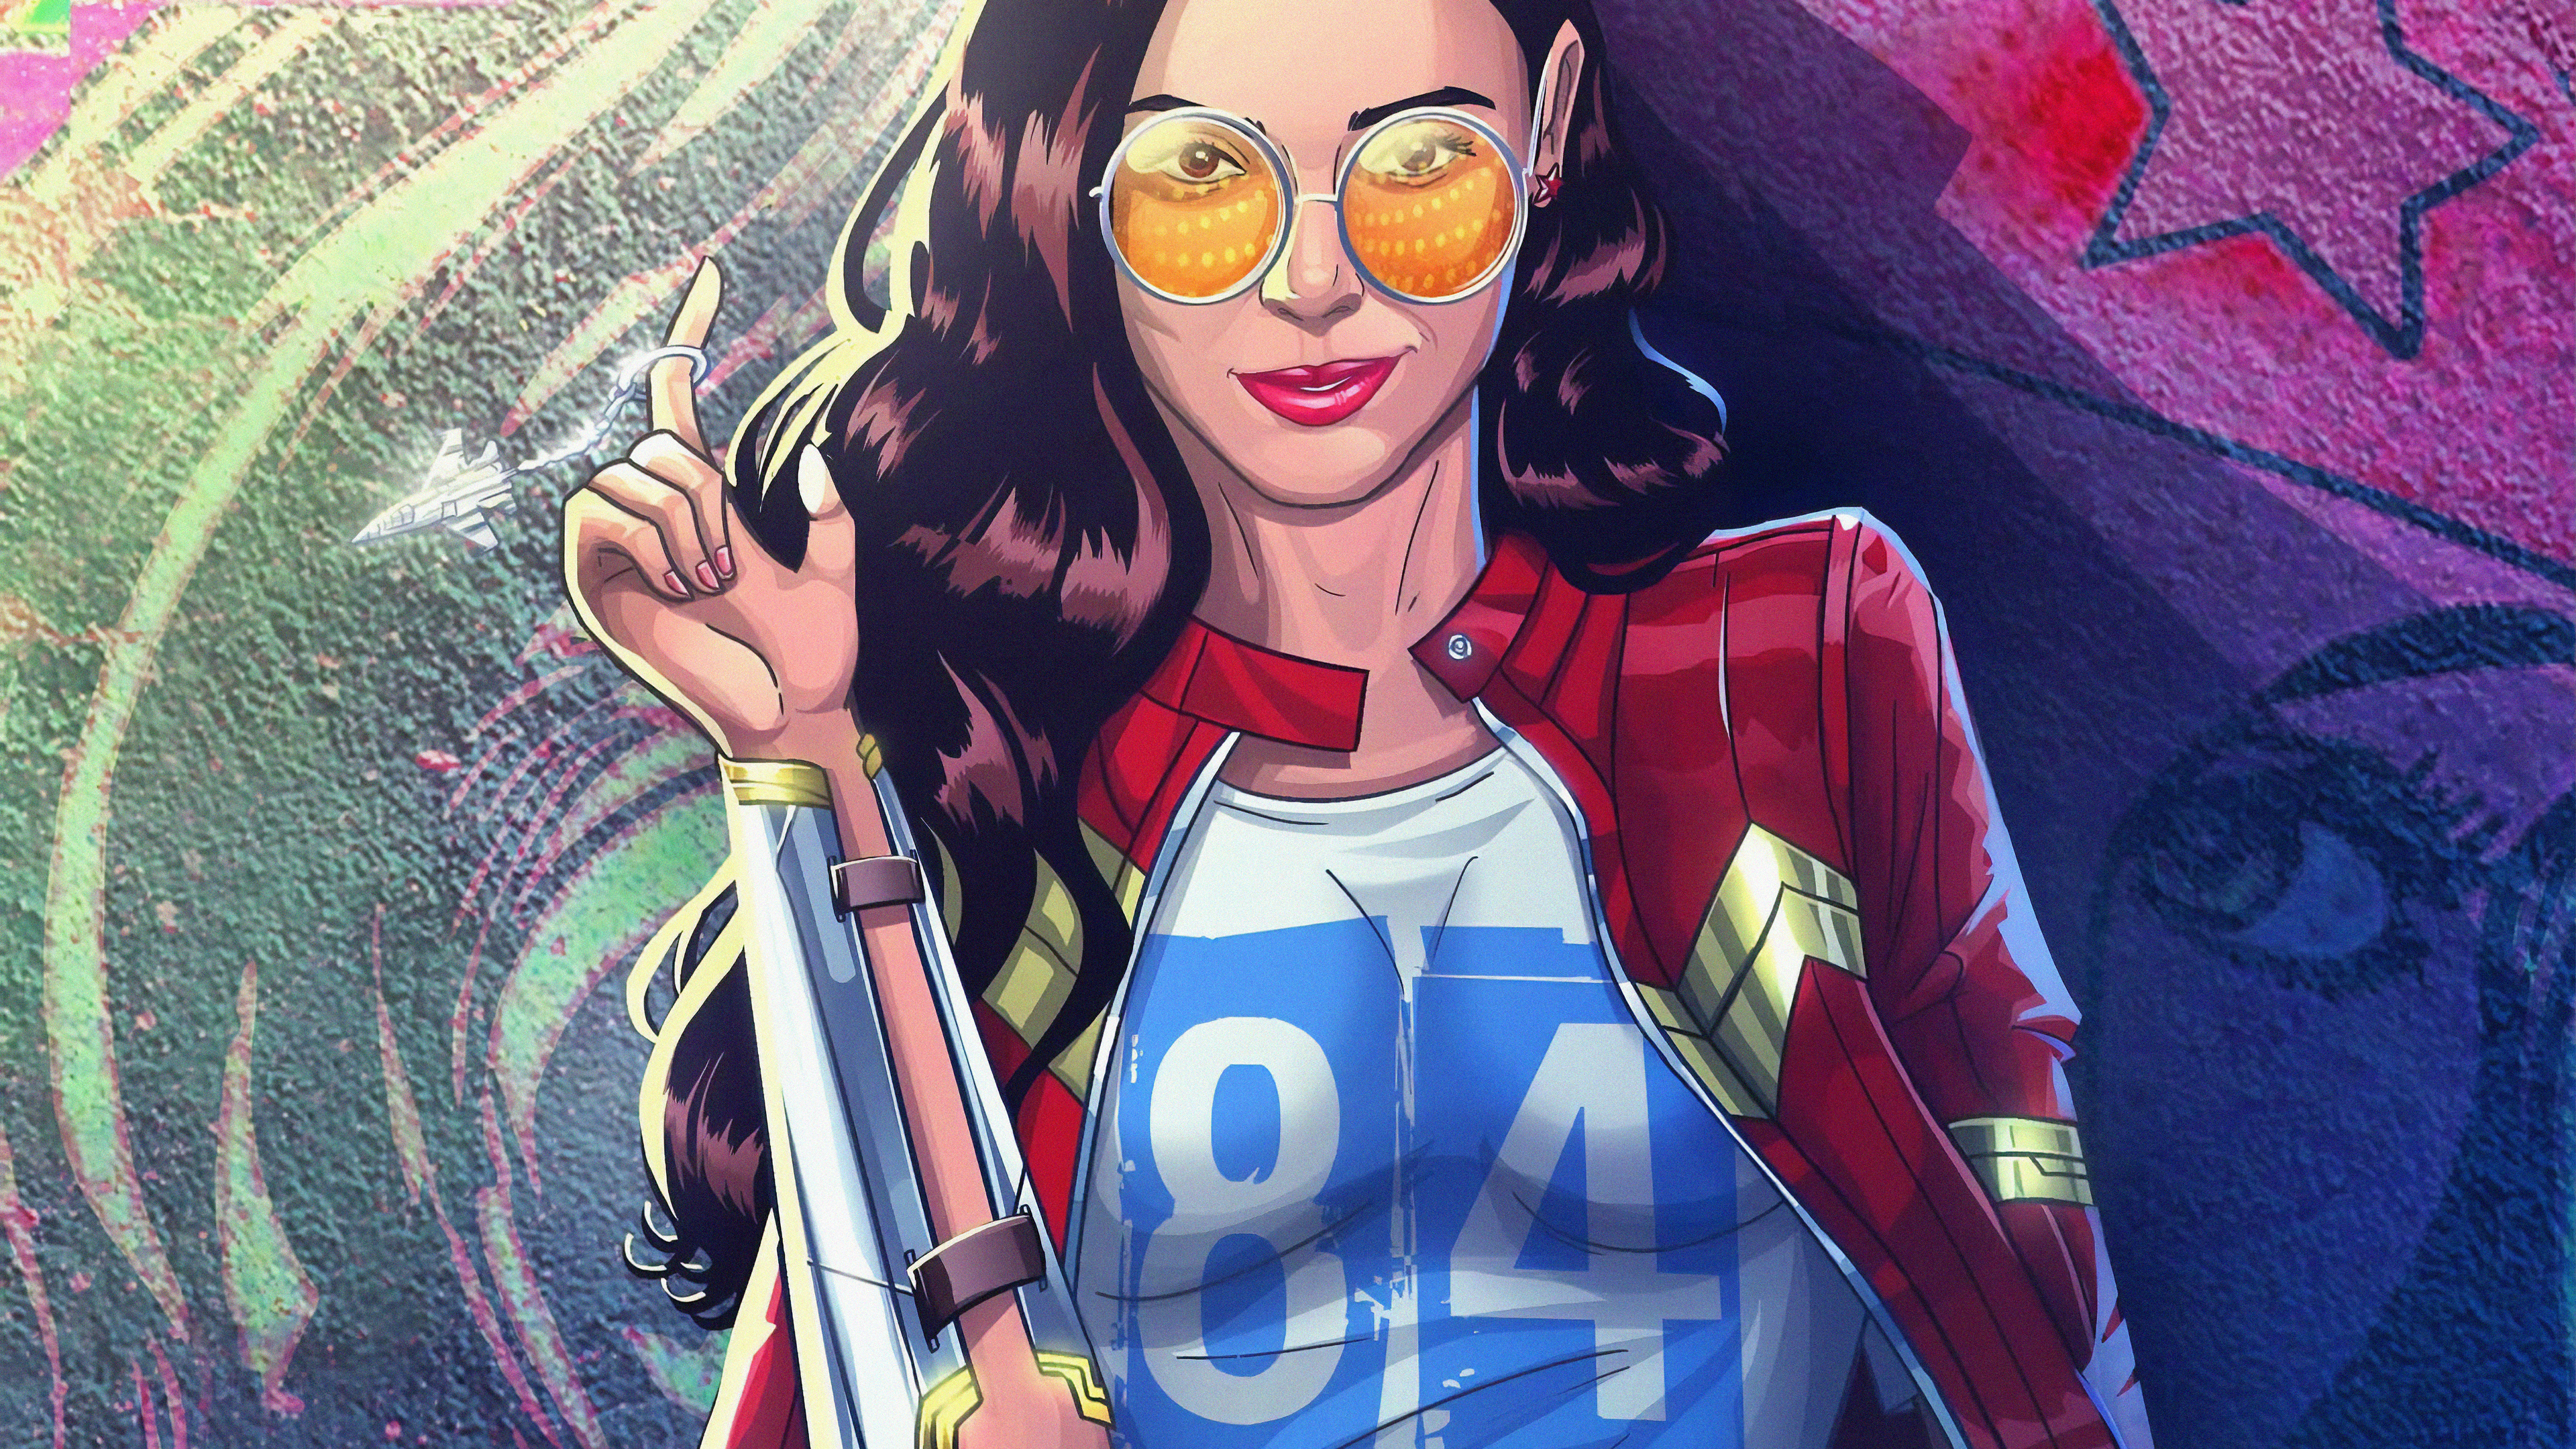 wonder woman 1984 modern art 1563220281 - Wonder Woman 1984 Modern Art - wonder woman wallpapers, superheroes wallpapers, hd-wallpapers, digital art wallpapers, artwork wallpapers, 4k-wallpapers